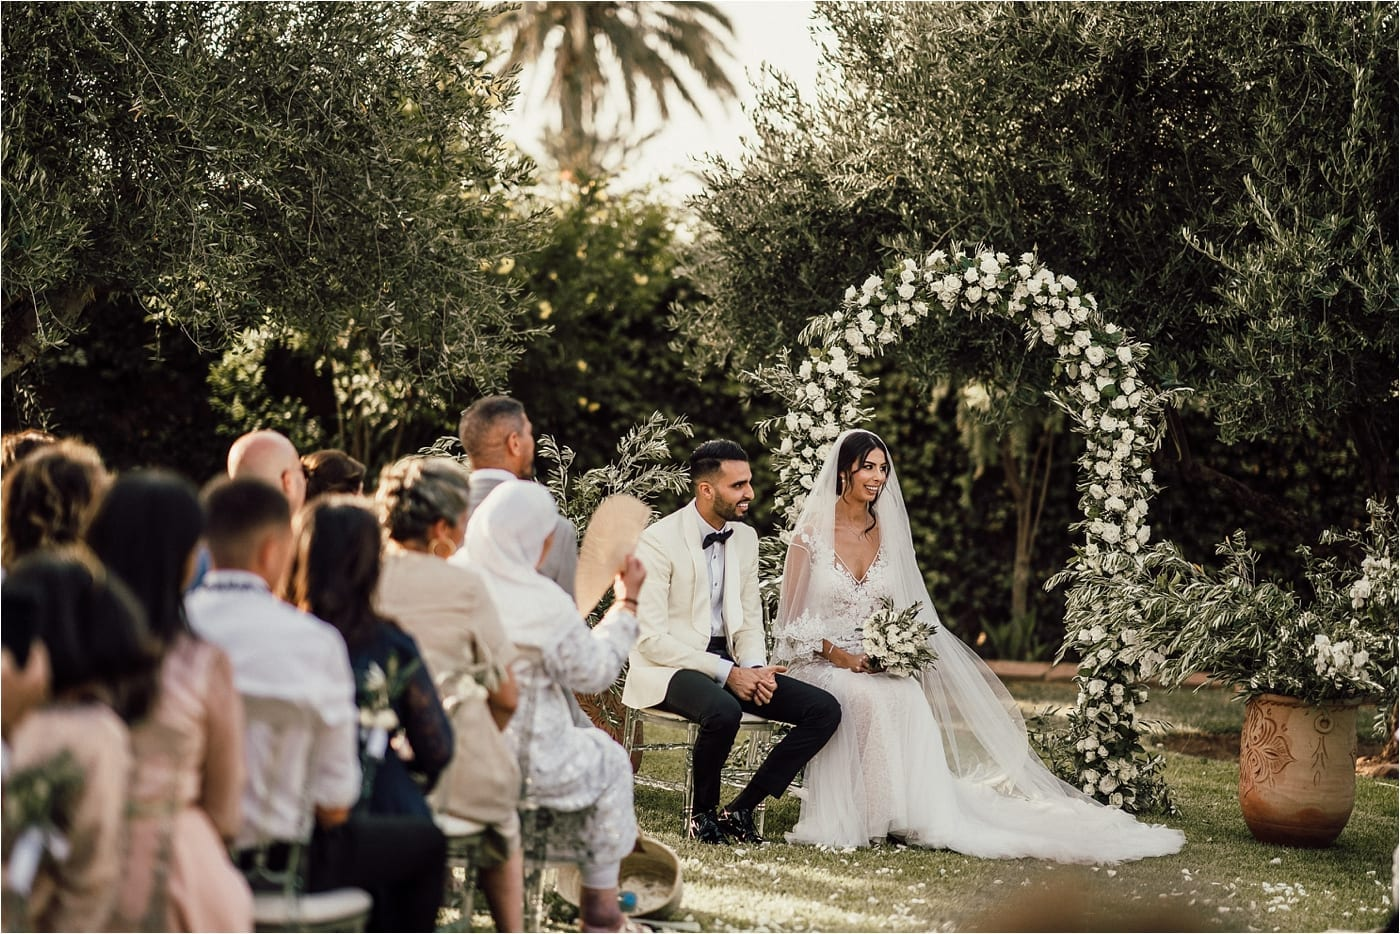 Mariage tradionnel marocain de M&F